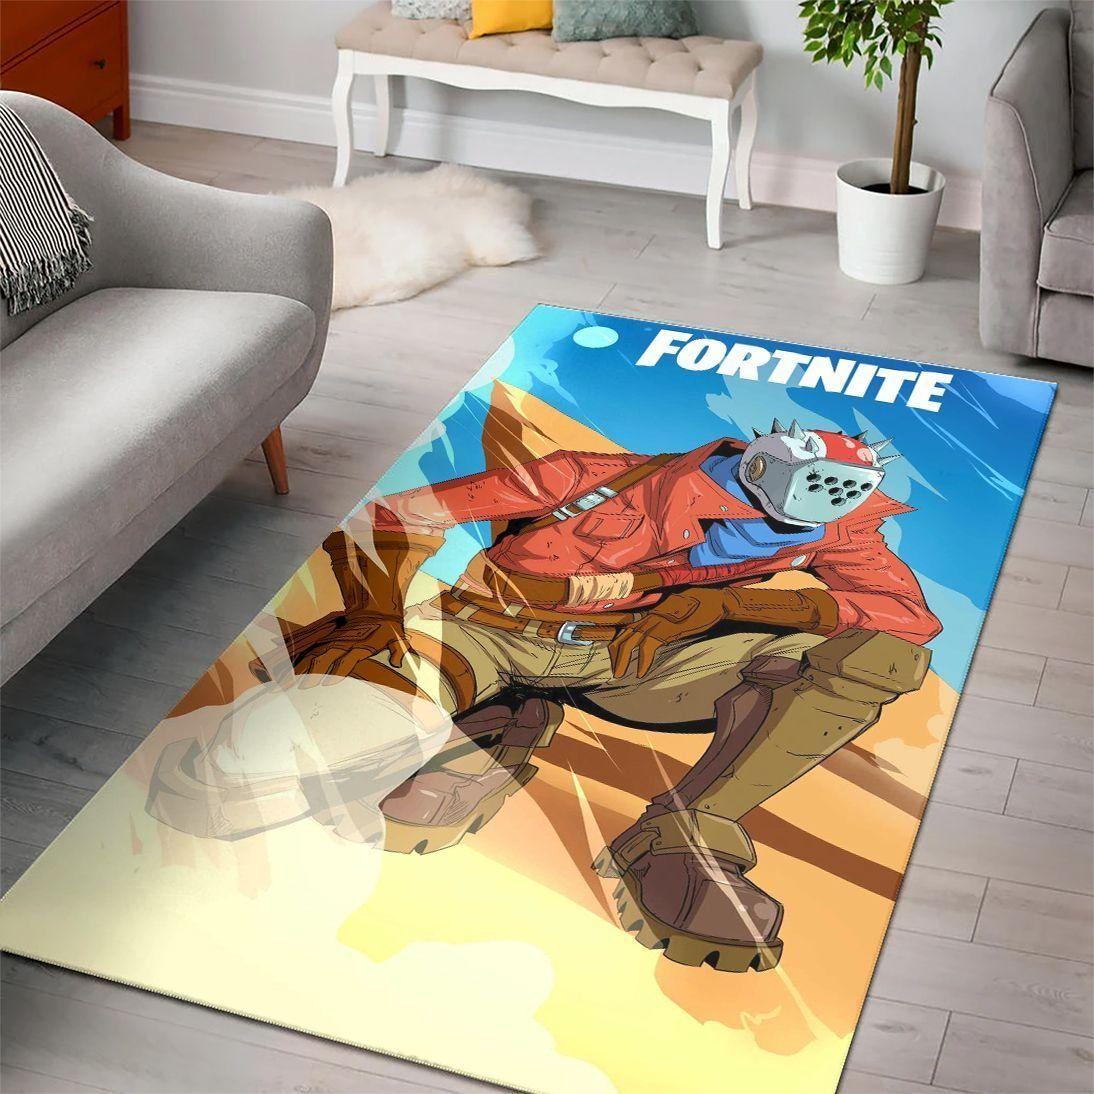 Rust Lord Of Fortnite Gaming Rug